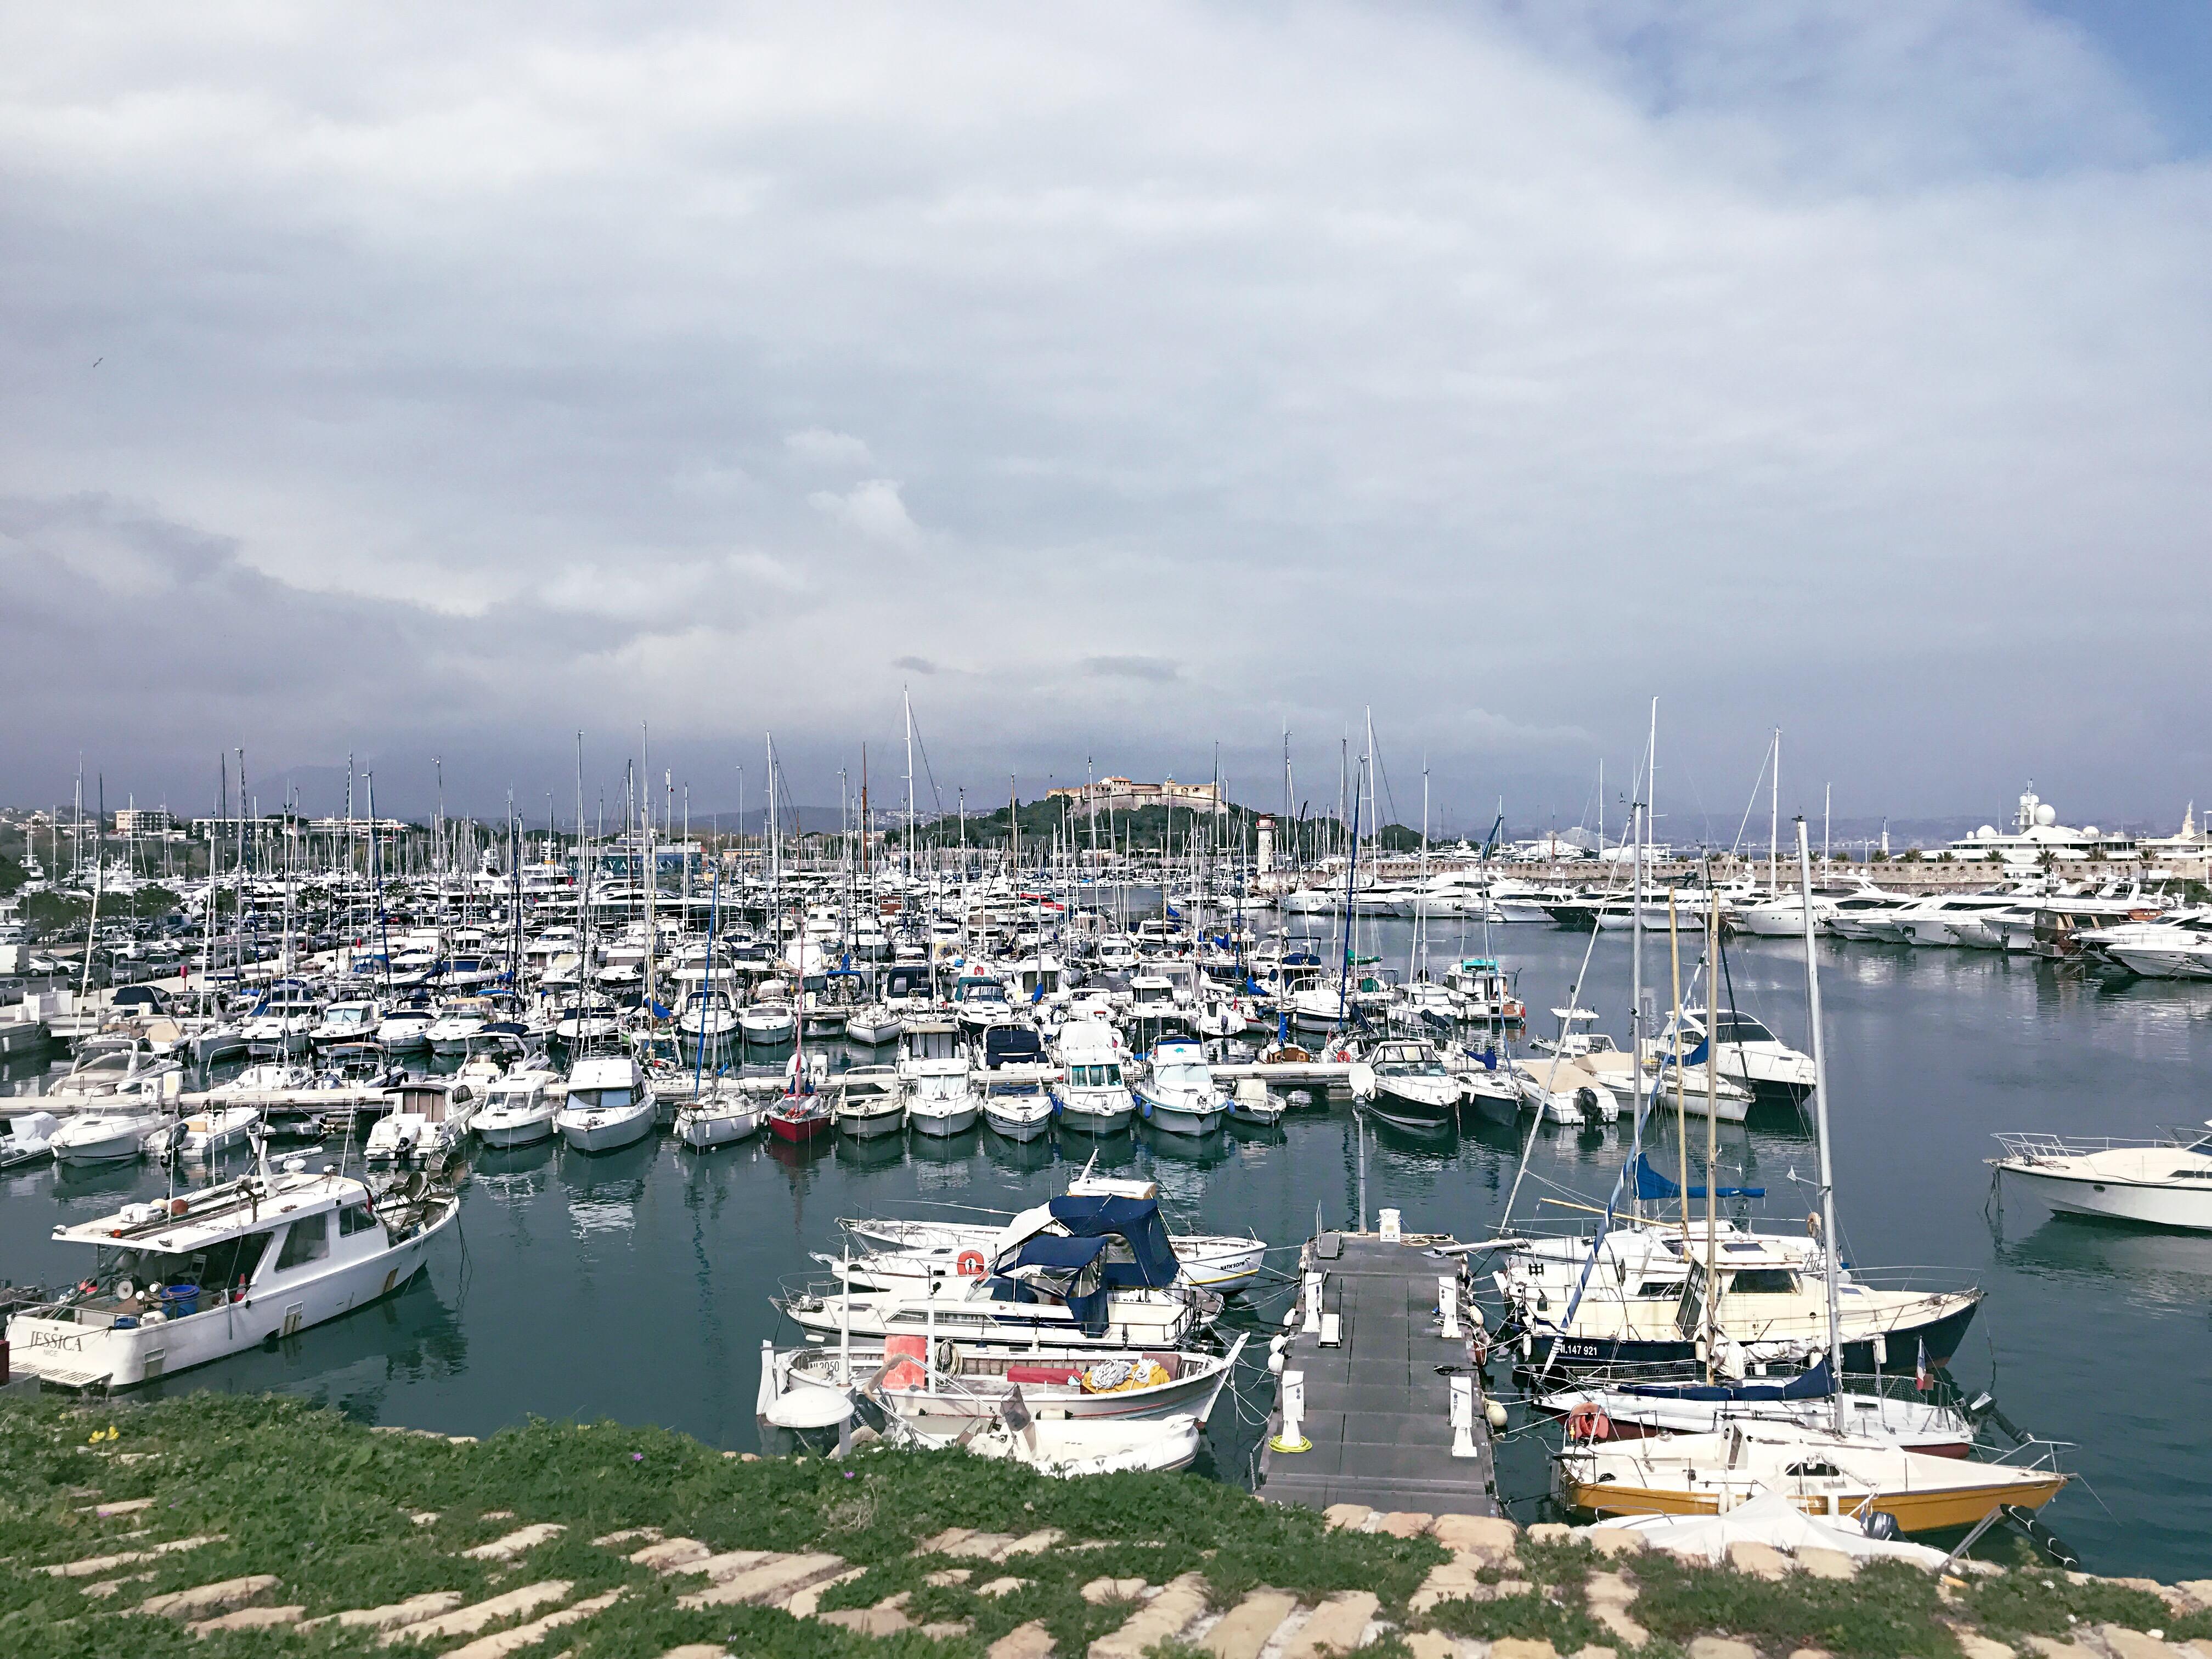 Lundi Soleil 27 mars 2017: le port Vauban à Antibes